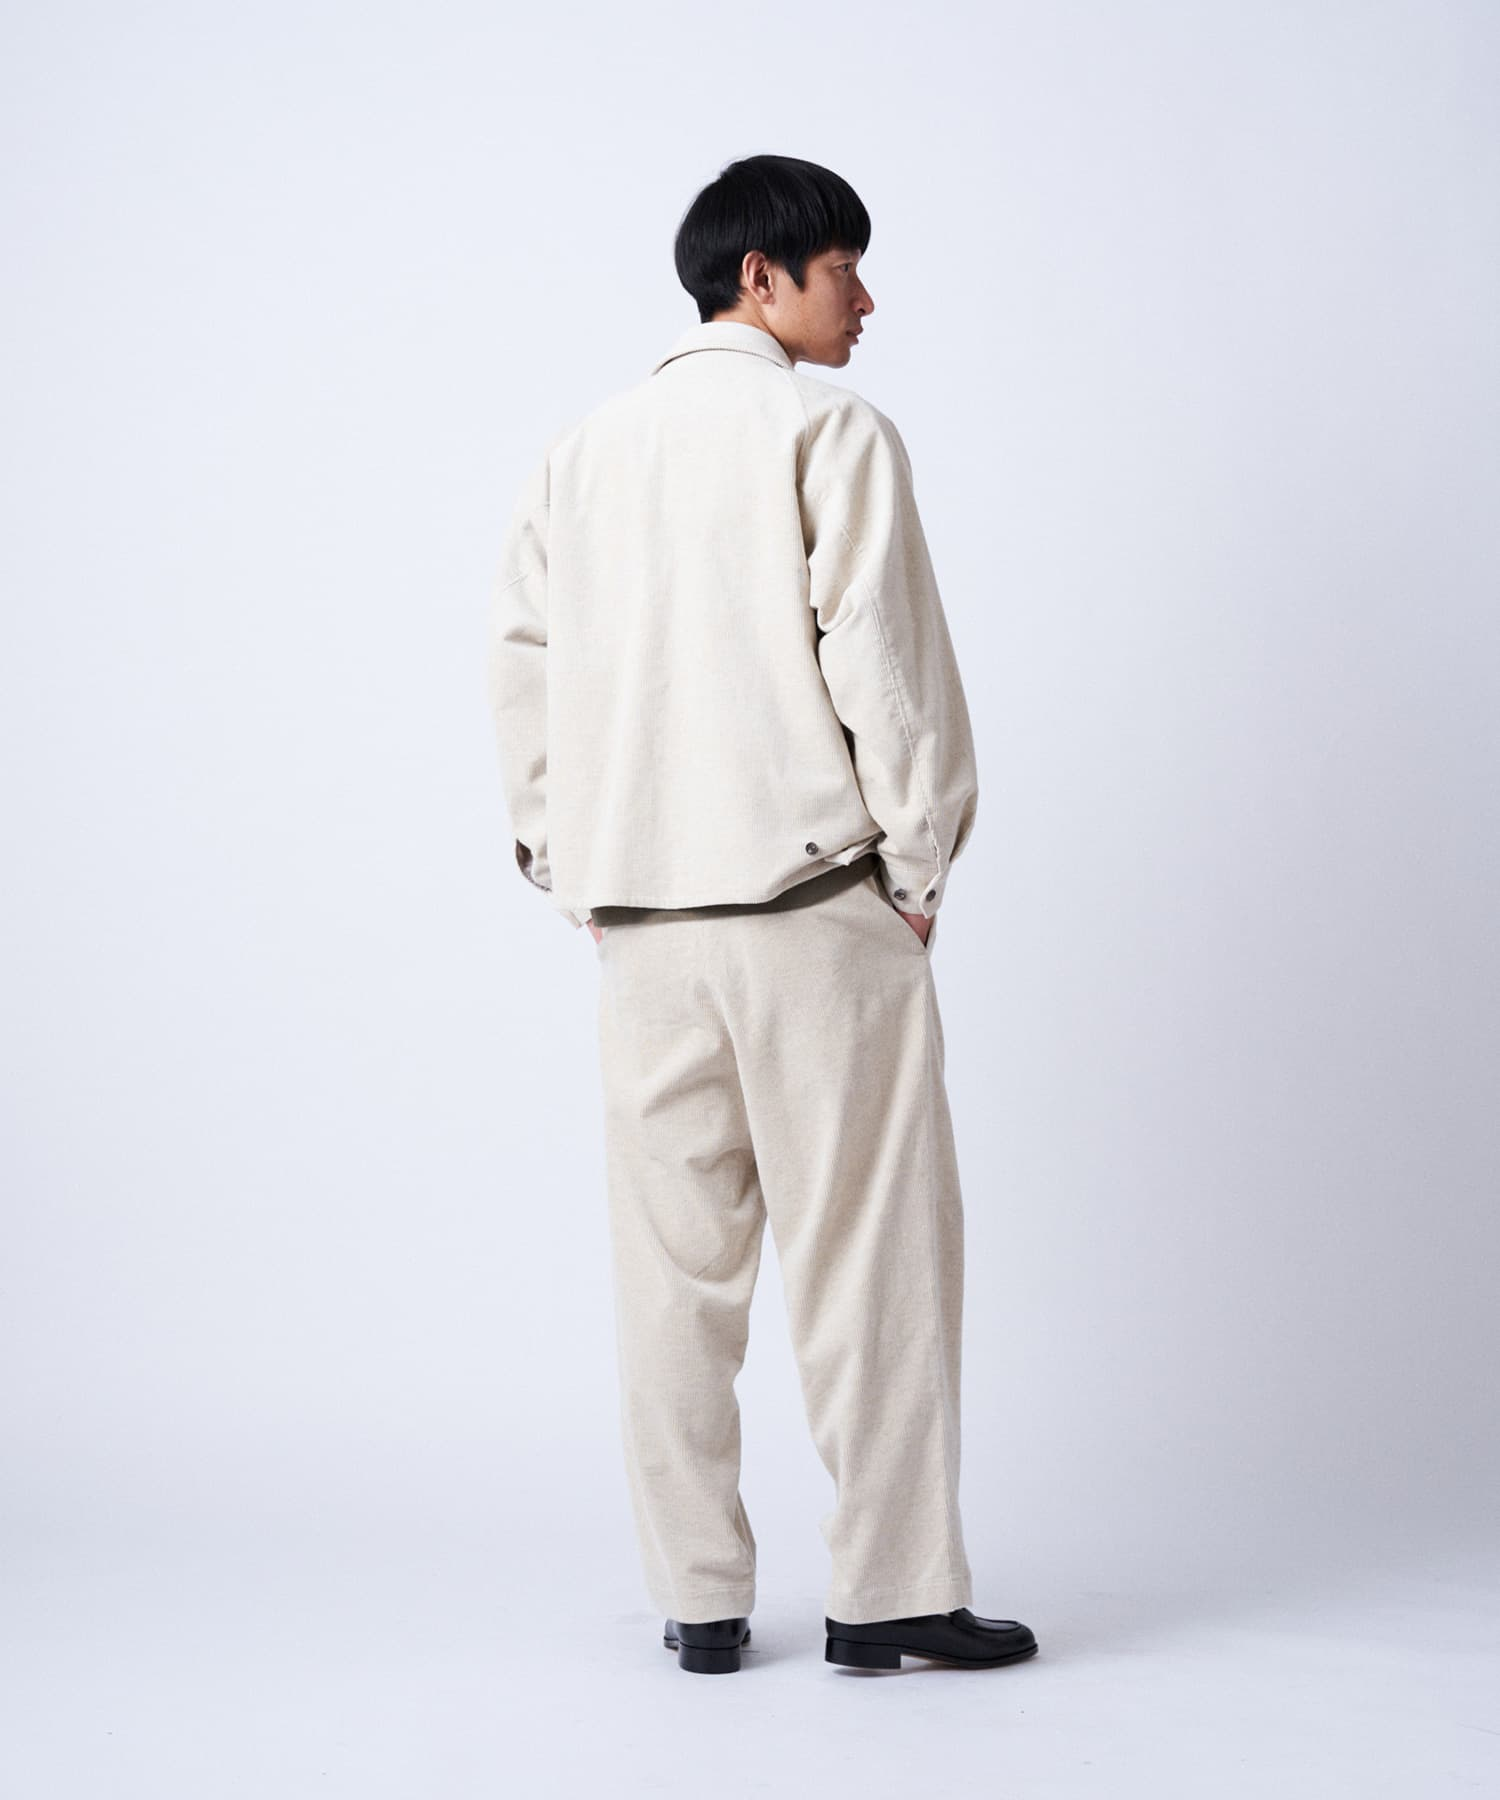 BLOOM&BRANCH(ブルームアンドブランチ) PHLANNÈL SOL / mens Harrington Jacket